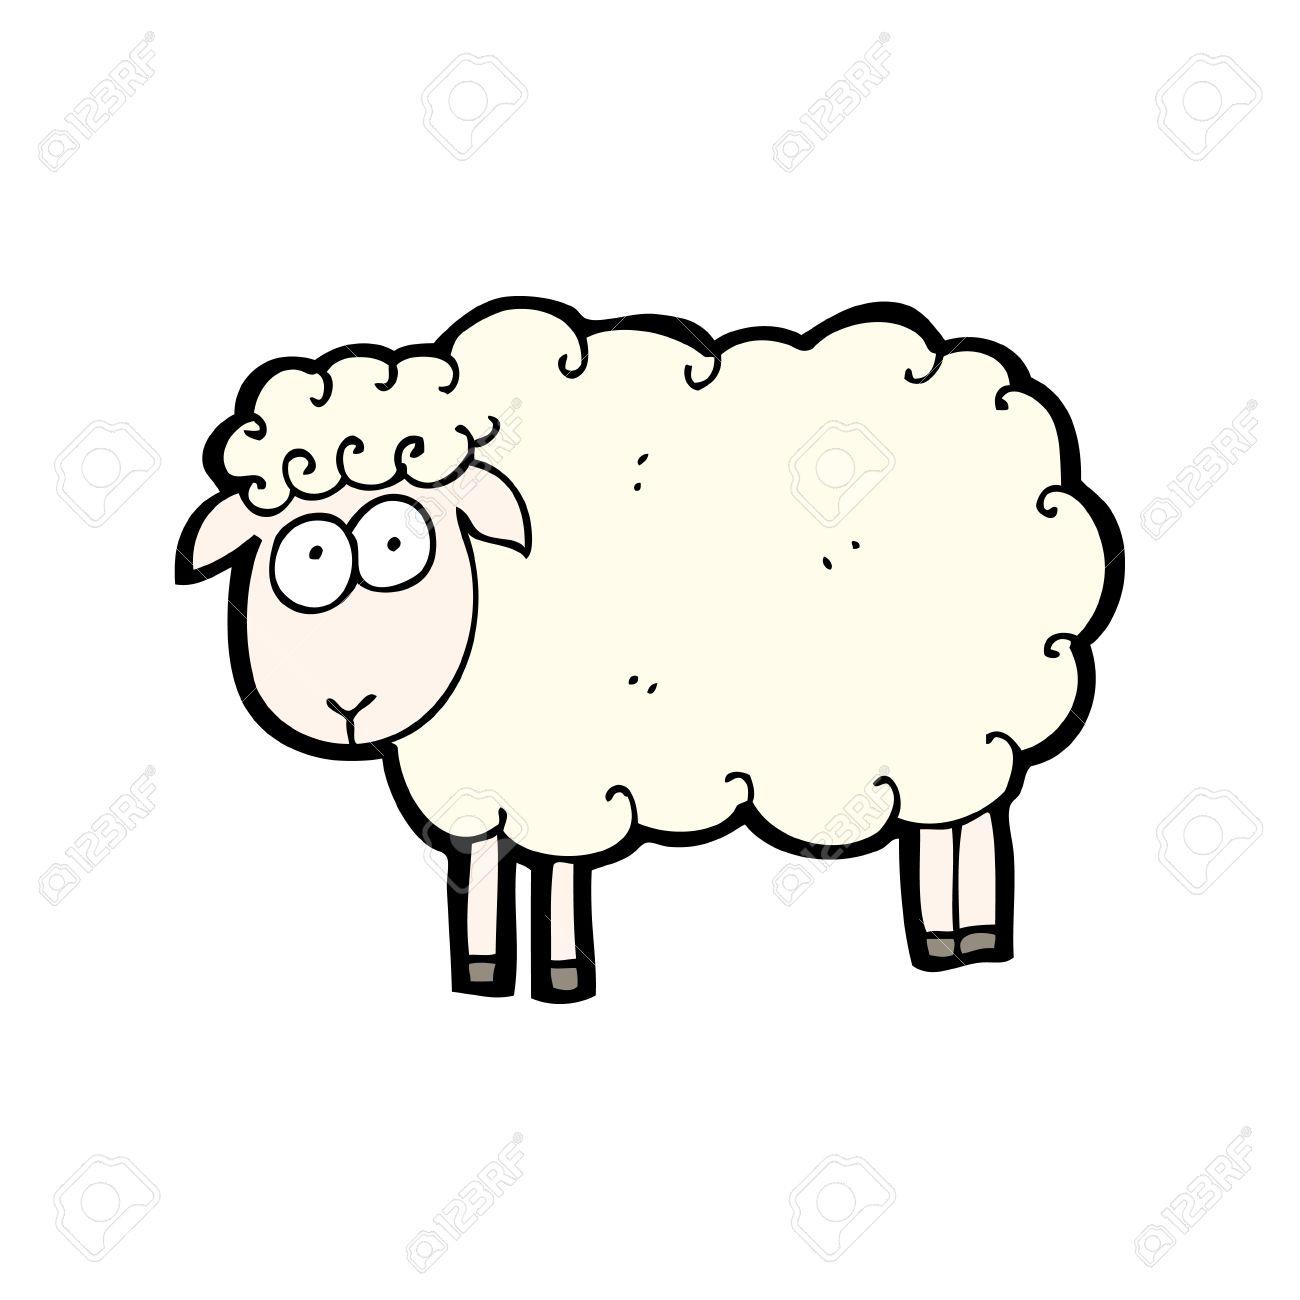 sheep cartoon drawing at getdrawings com free for personal use rh getdrawings com lamb clip art free lamb clip art black and white